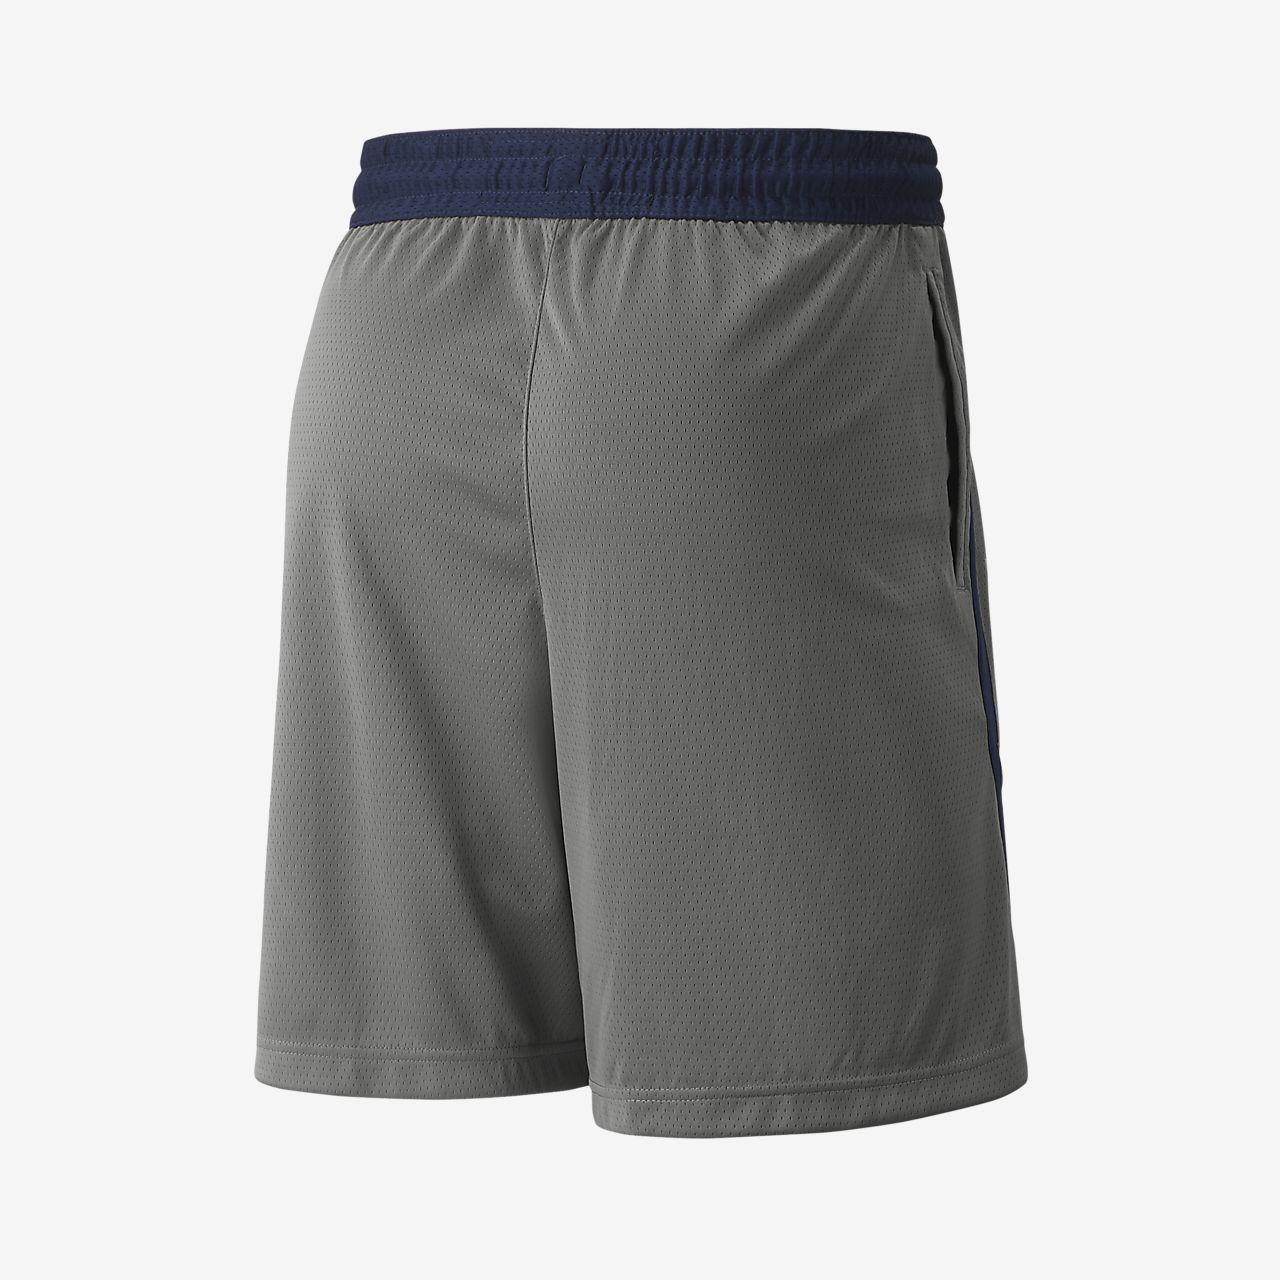 9e1cbaf43 Indiana Pacers City Edition Swingman Men s Nike NBA Shorts. Nike.com AU